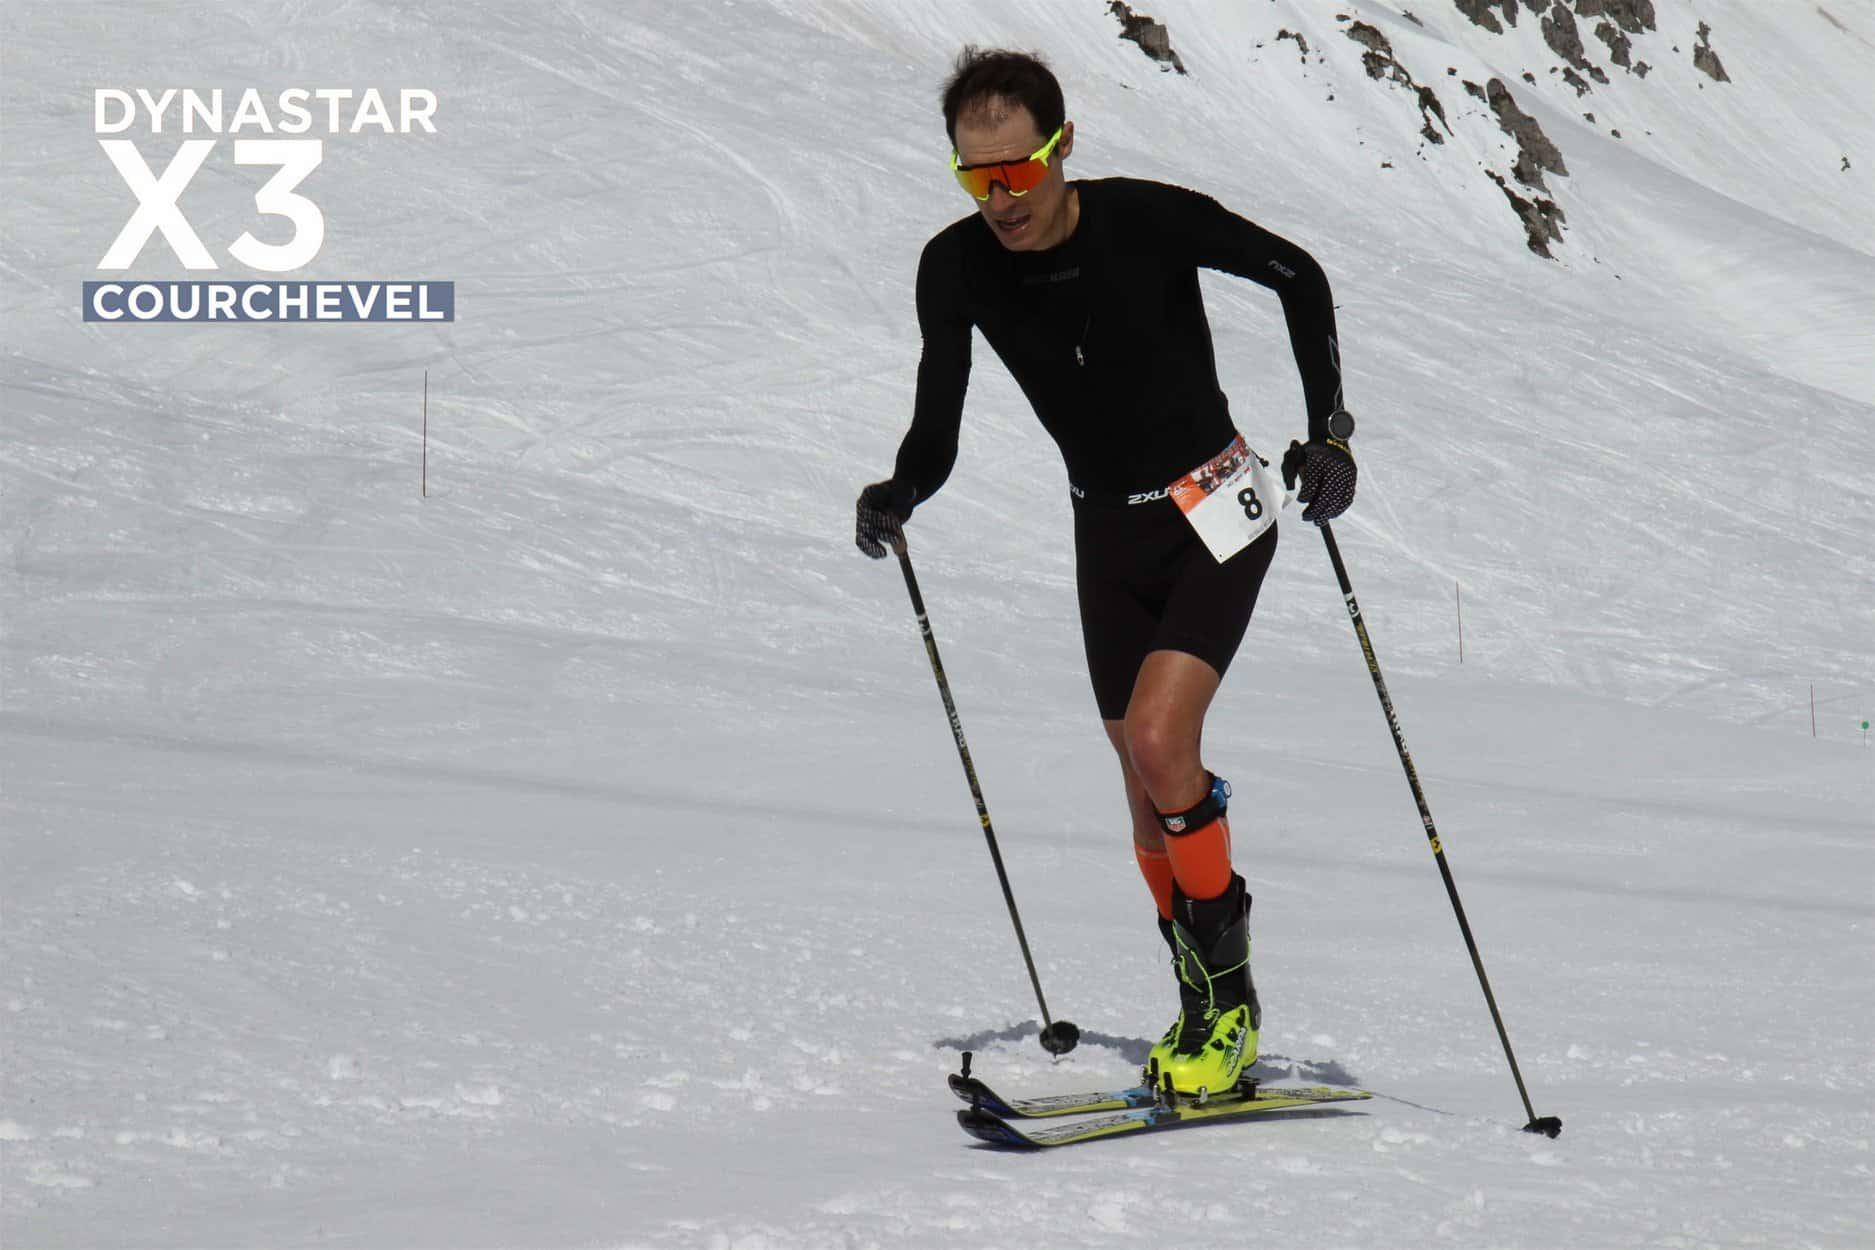 nicolas raybaud en ski trab dans la montée du triathlon dynastar X3 courchevel